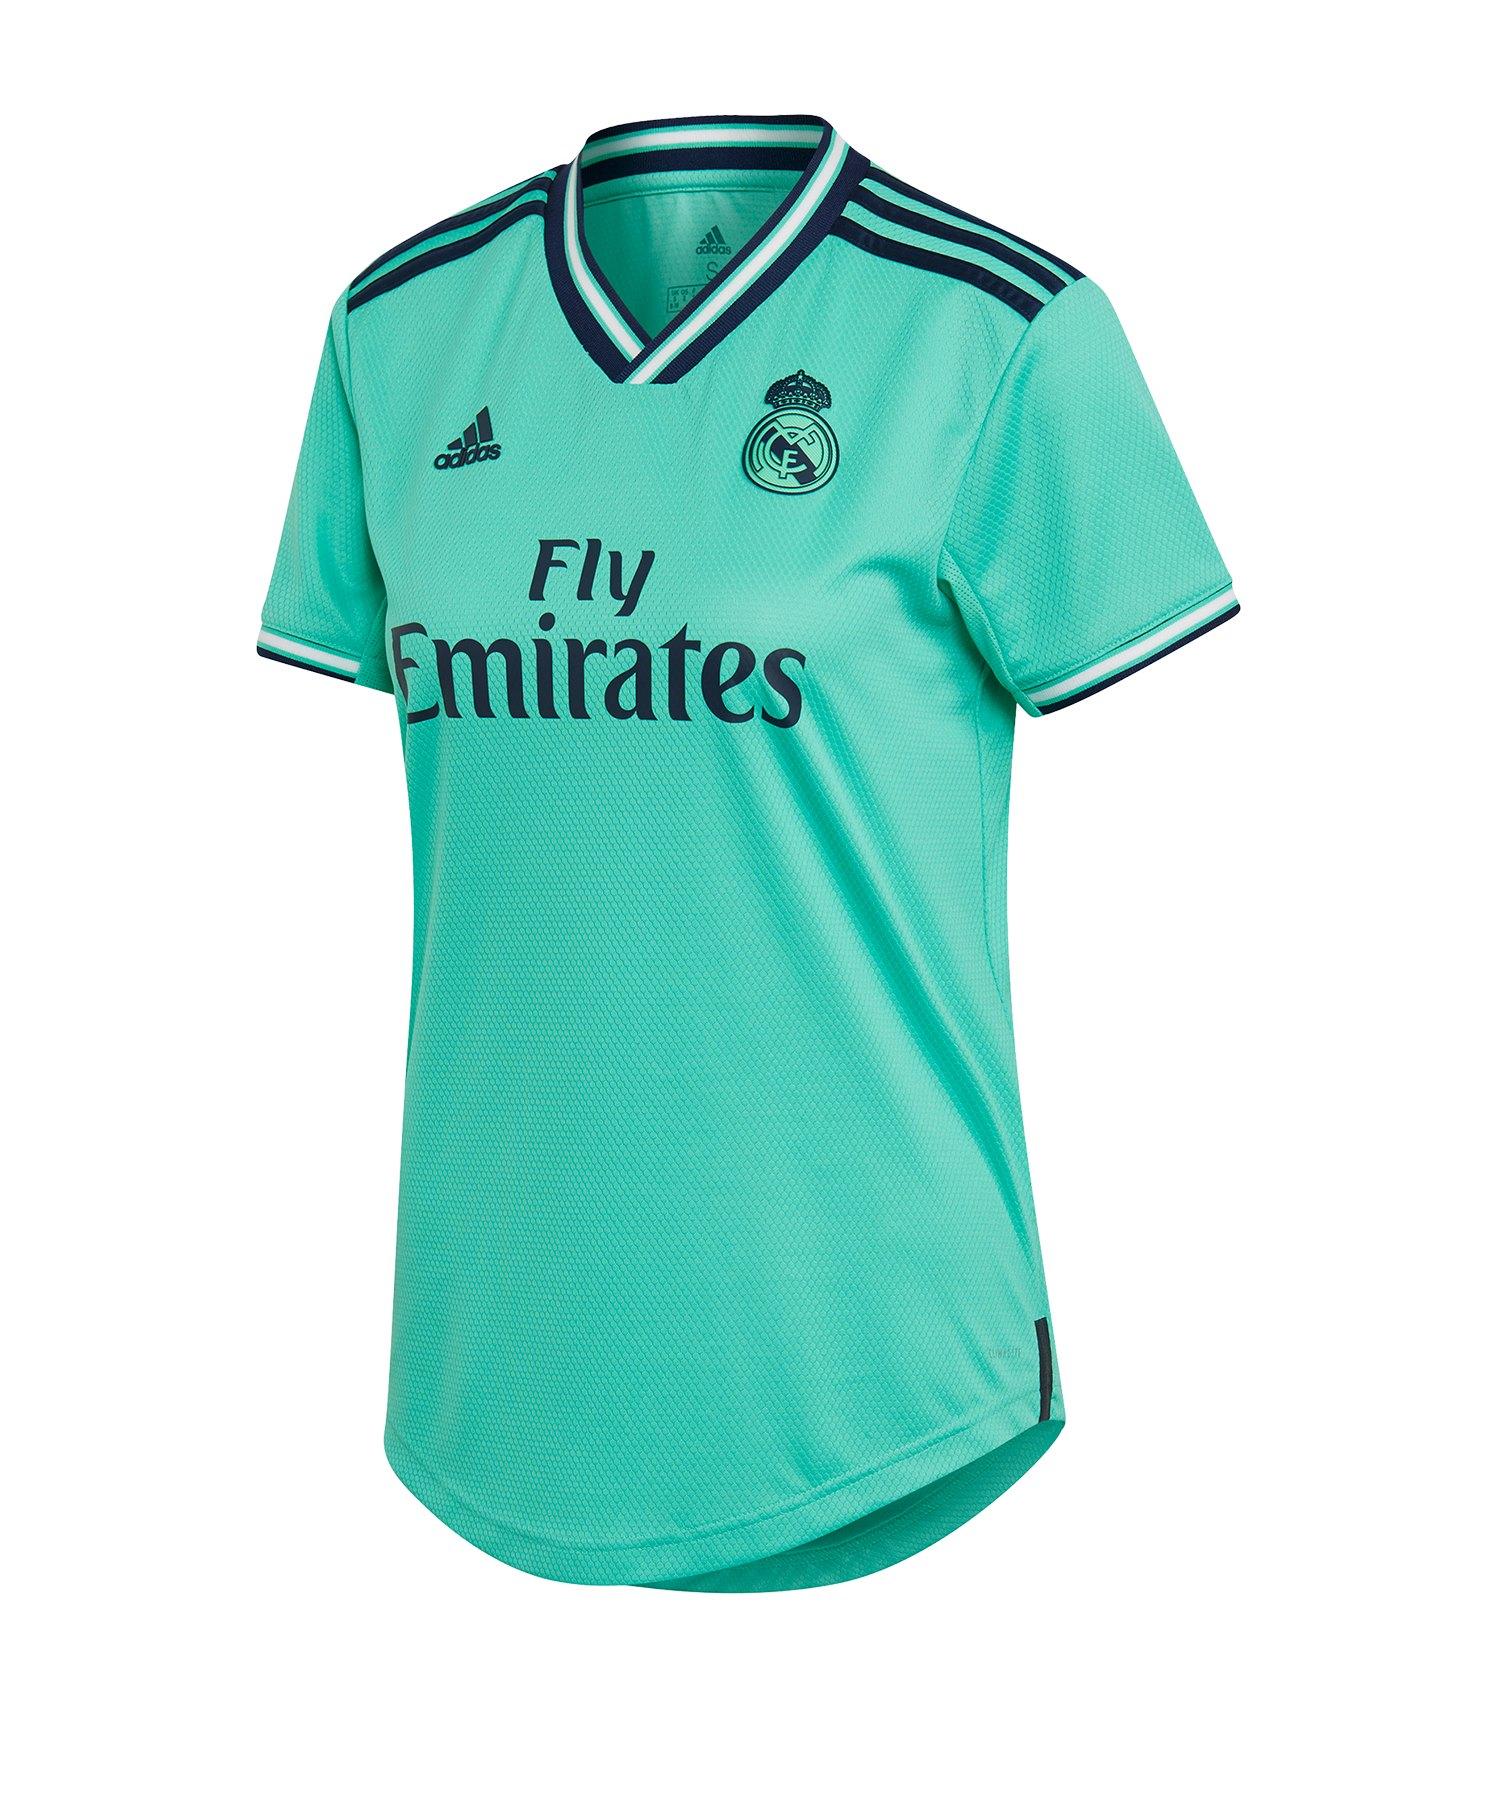 adidas Real Madrid Trikot UCL 2019/2020 Damen Grün - gruen